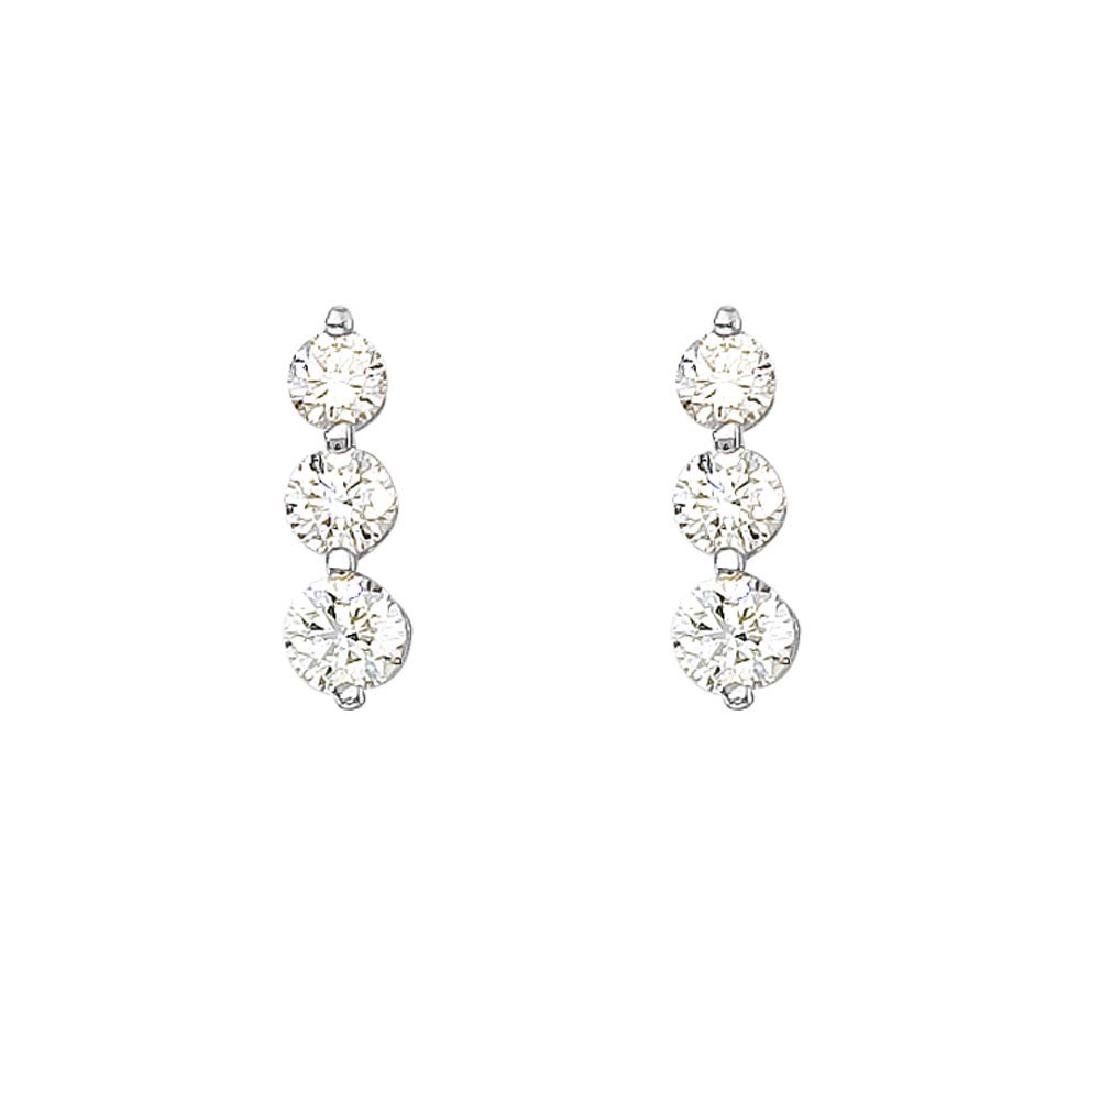 Certified 14k White Gold 1.50 ct 3 Stone Diamond Earrin